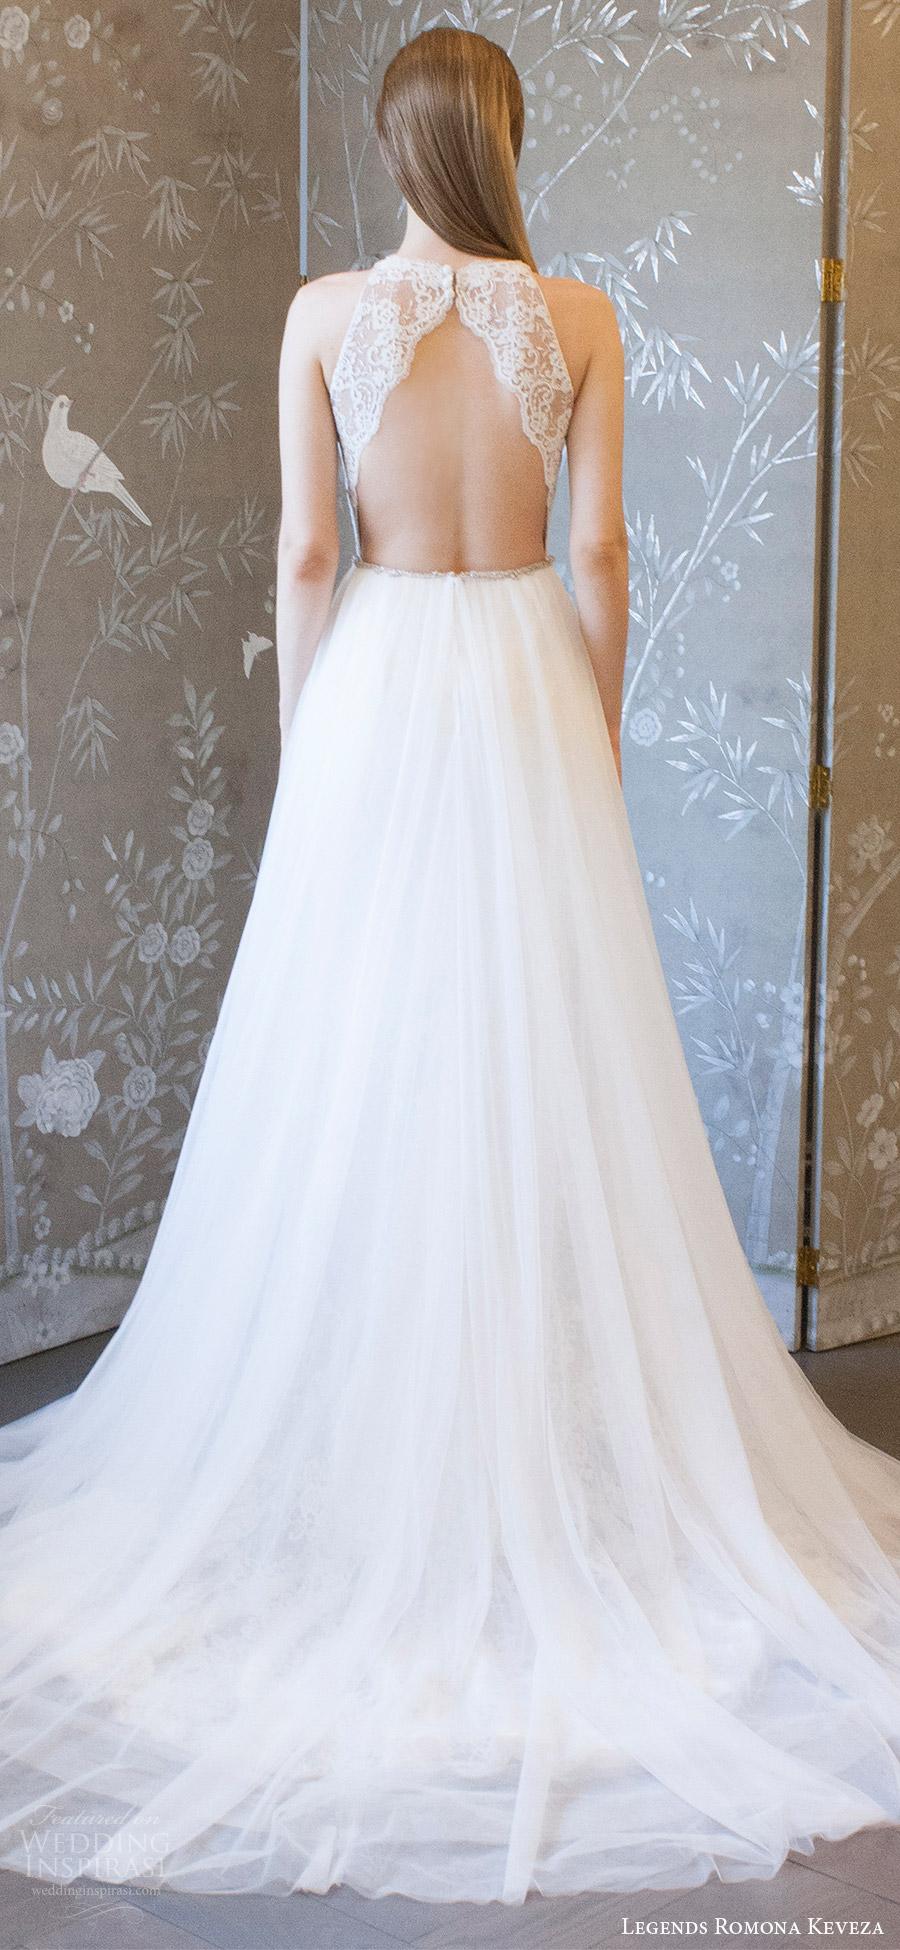 legends romona keveza spring 2018 bridal sleeveless deep v neck lace bodice a line wedding dress (l8127 skt) bv keyhole back romantic train elegant